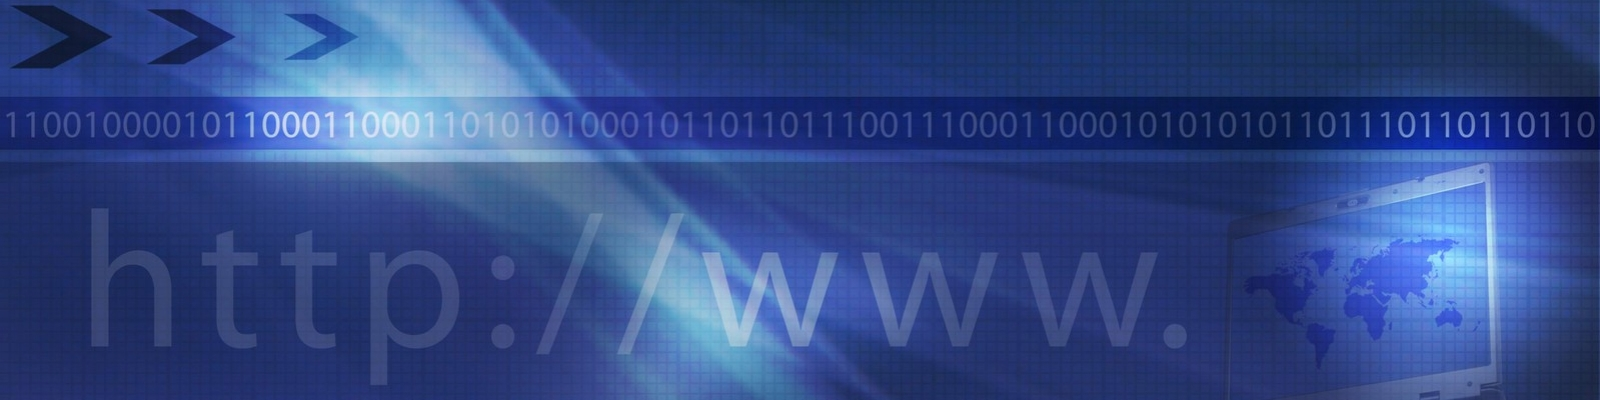 internet-and-future-1154207-1599×896